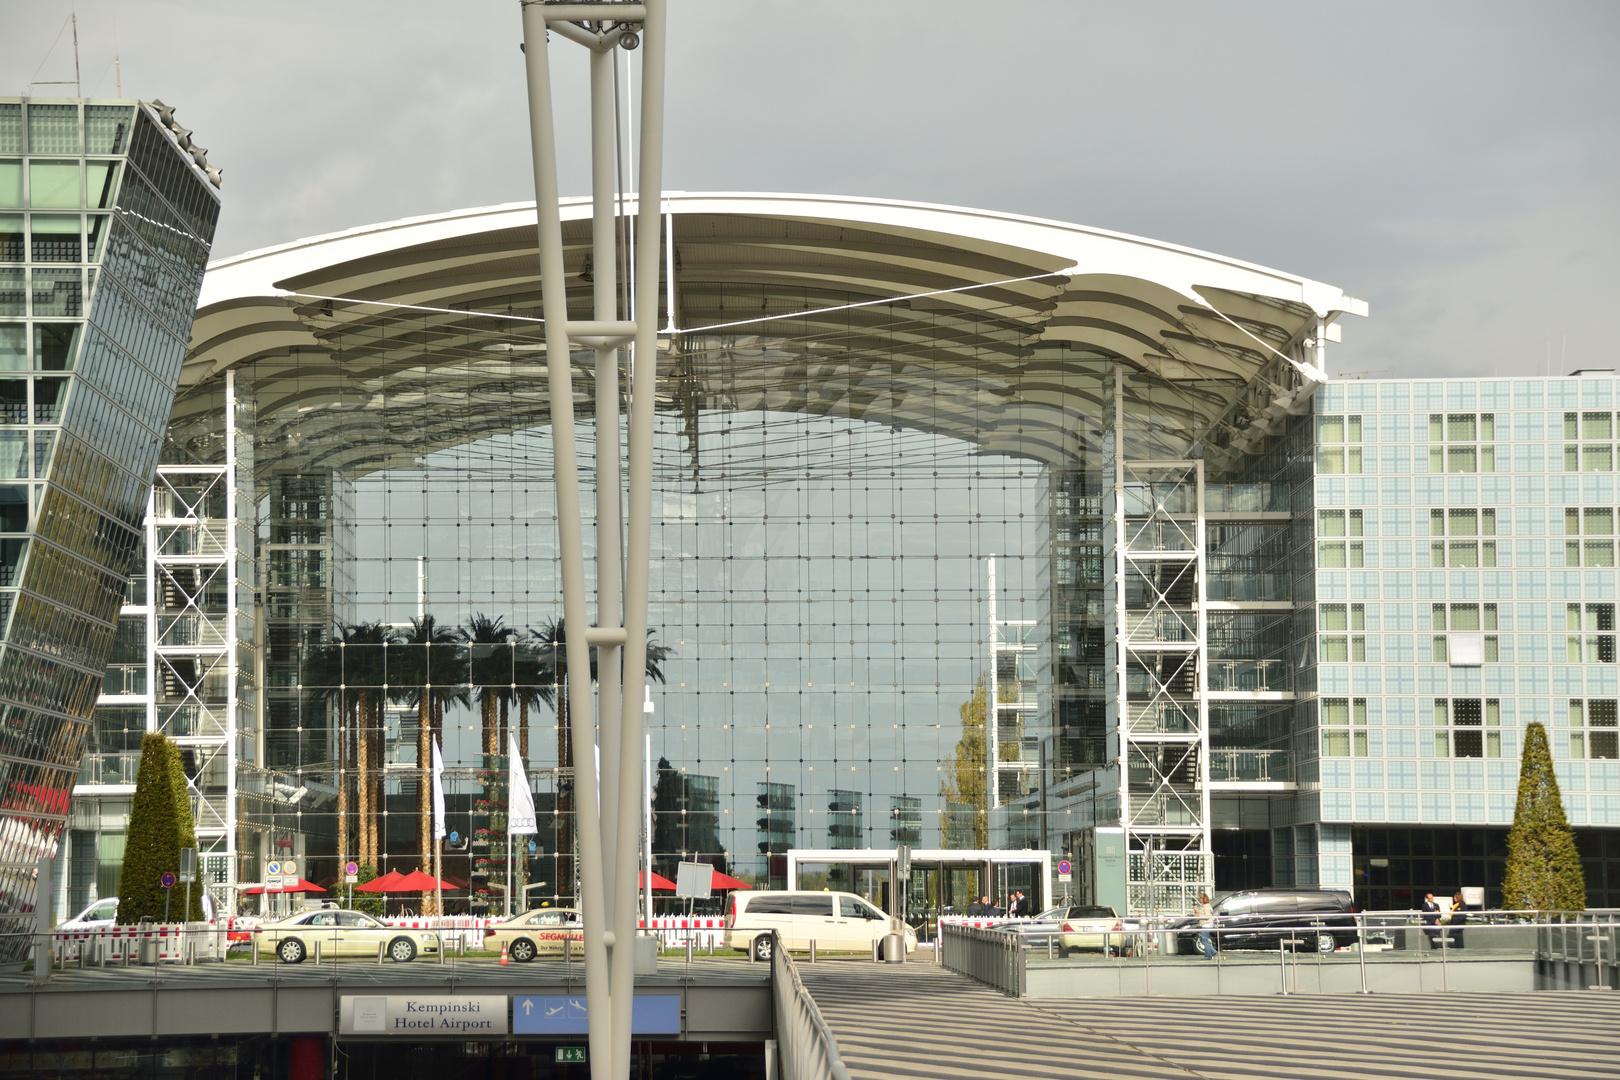 Flughafen München Hotel Kempinski ................